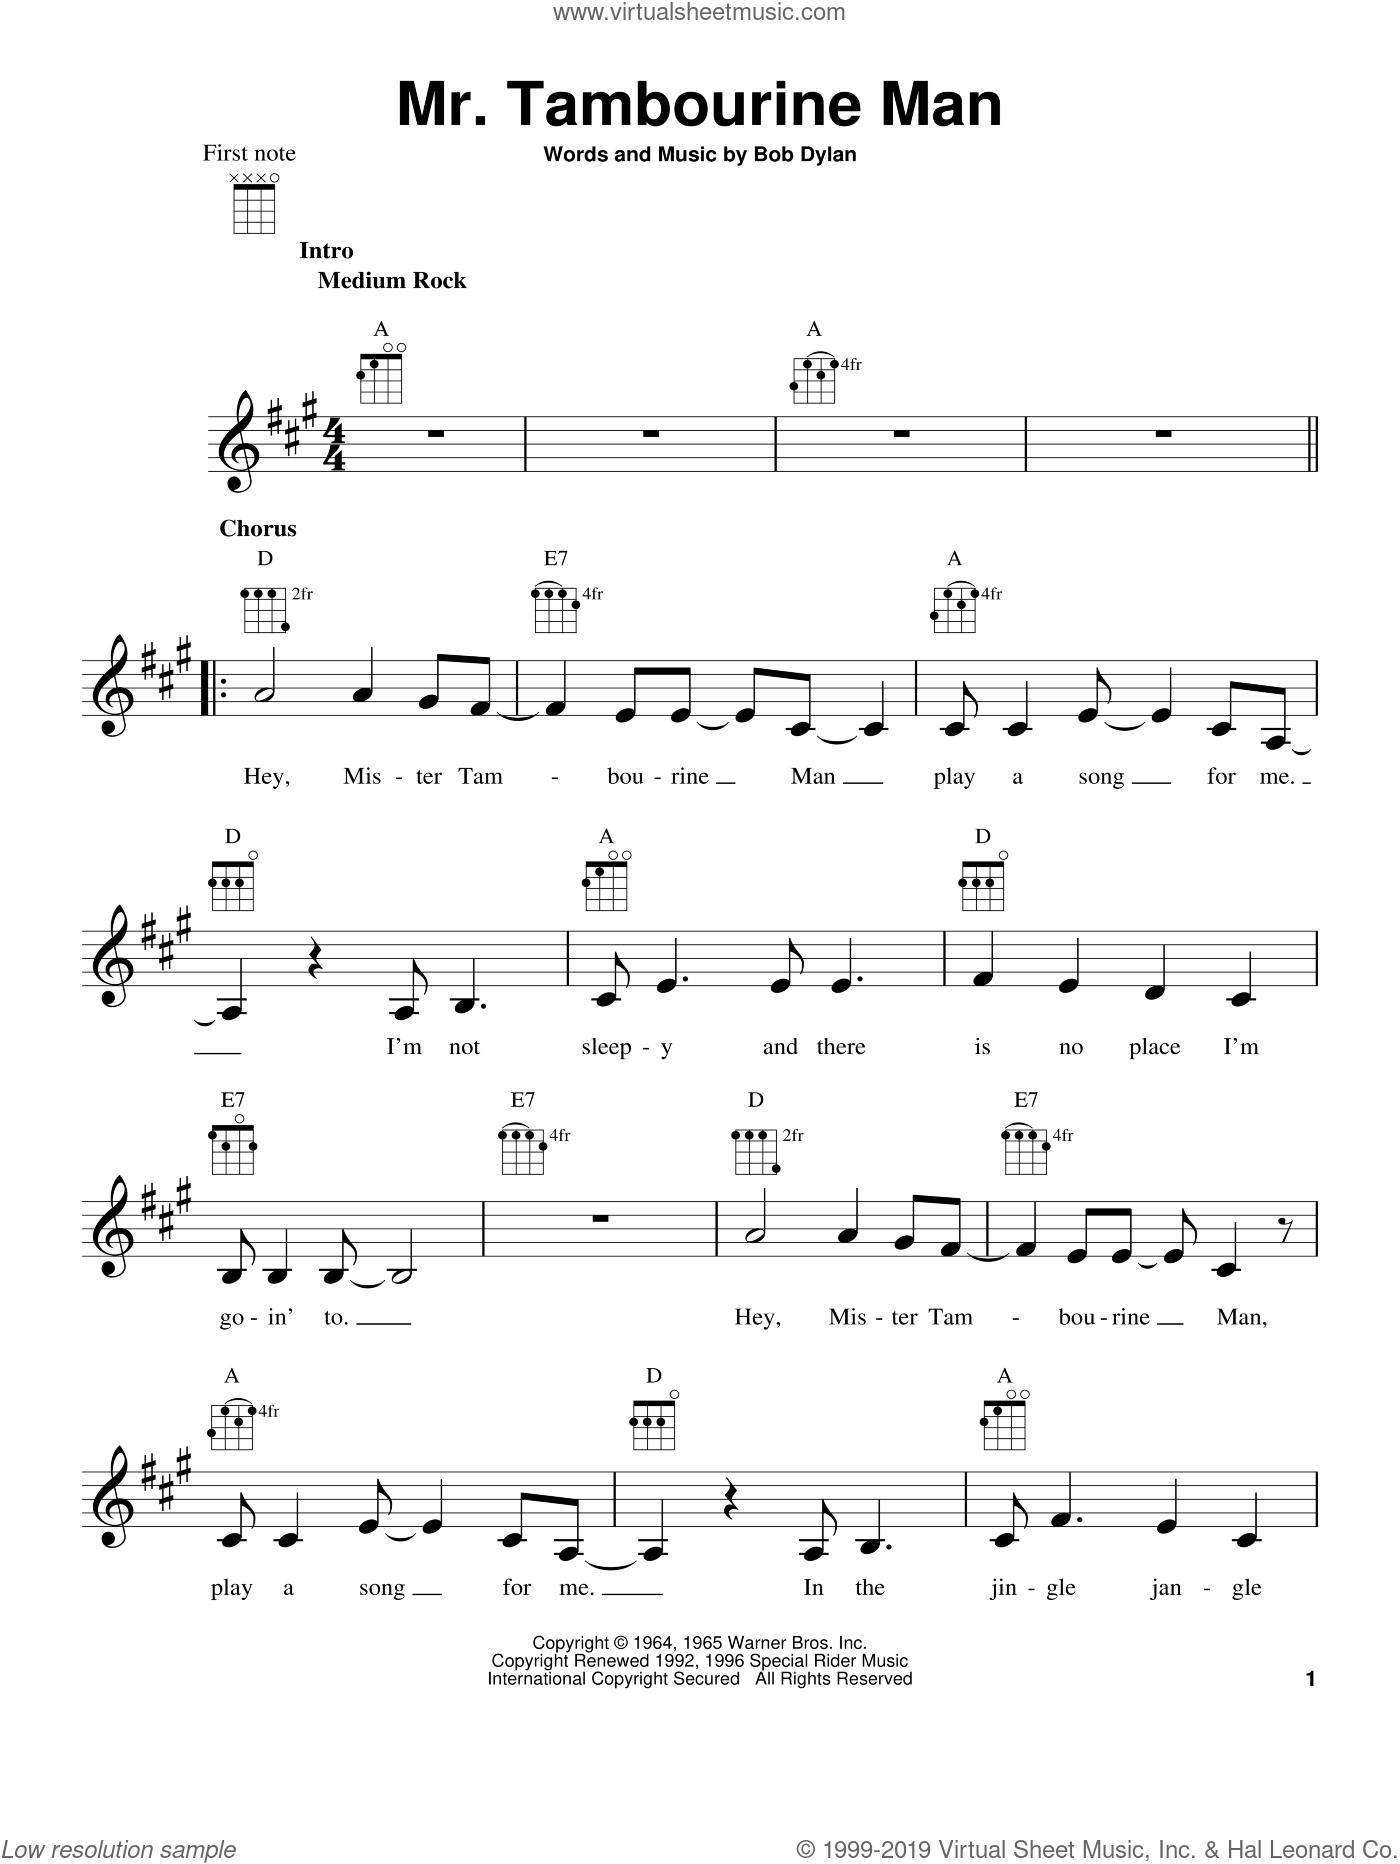 Mr. Tambourine Man sheet music for ukulele by Bob Dylan, intermediate skill level